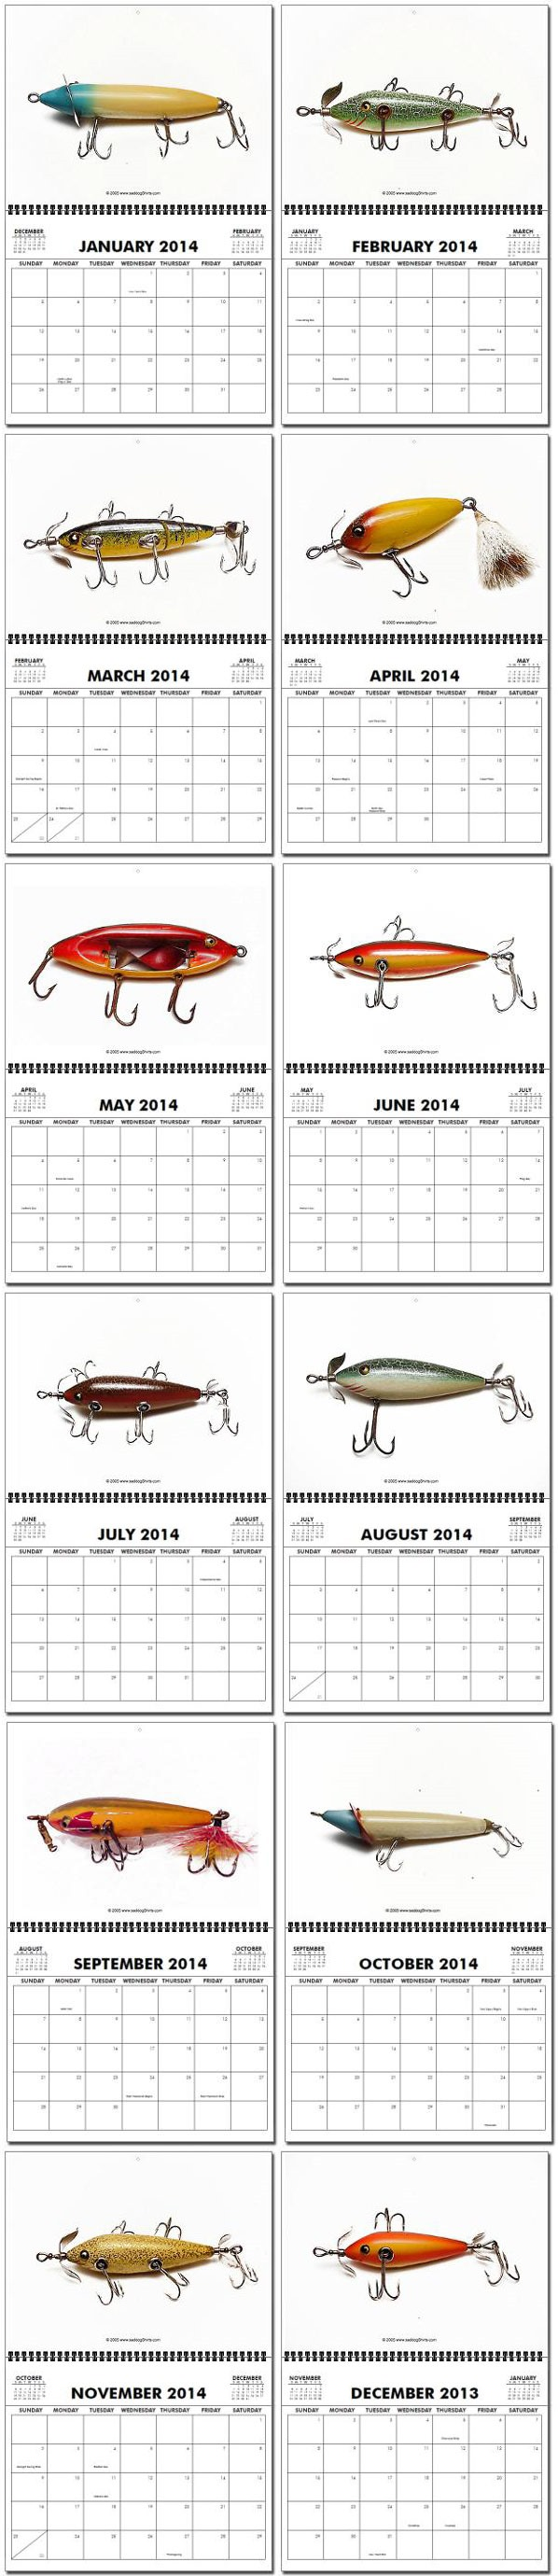 Vintage-lures-Calendar